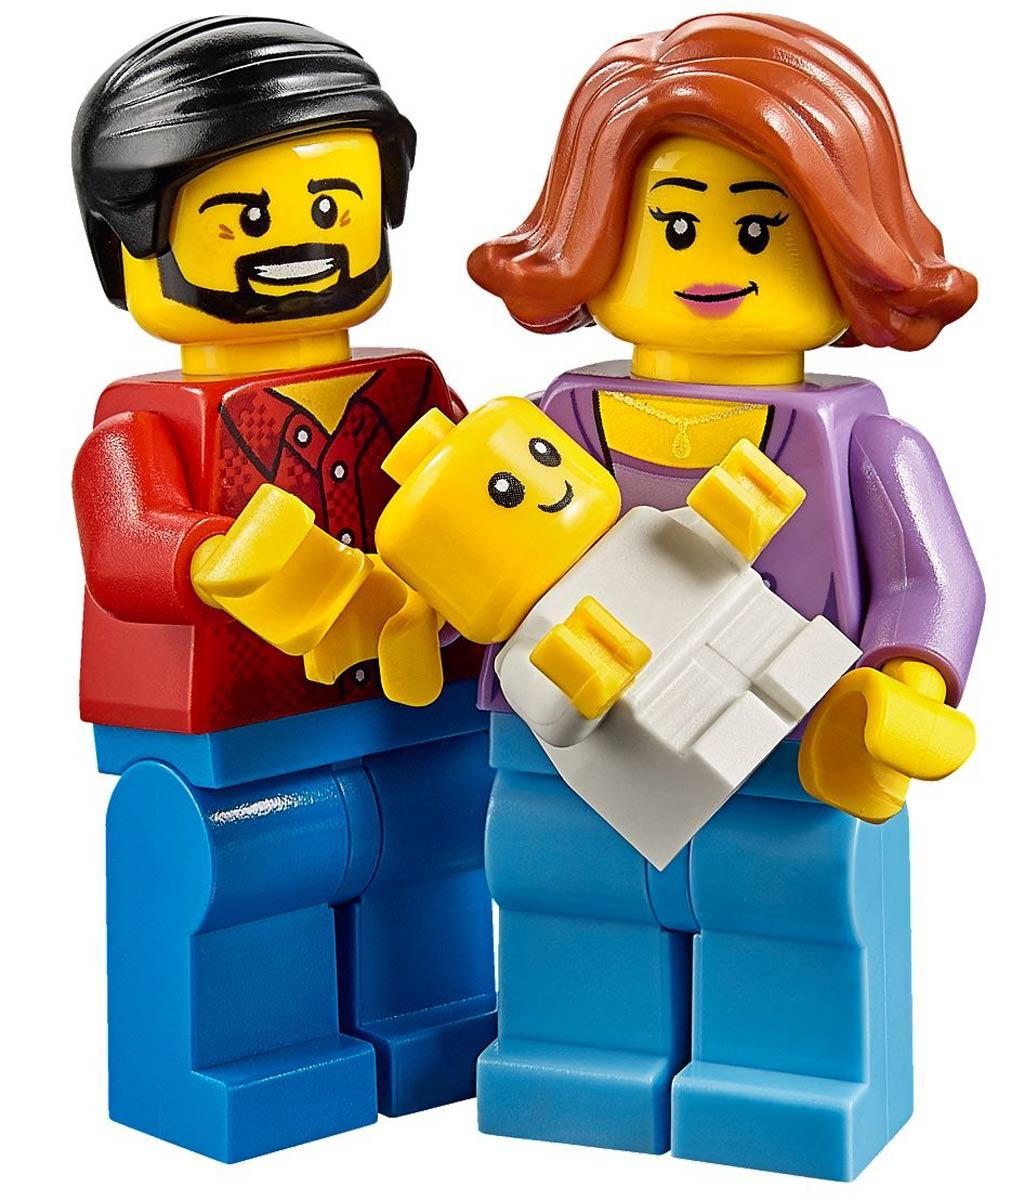 Das ist Jörn-Patrice | © LEGO Group